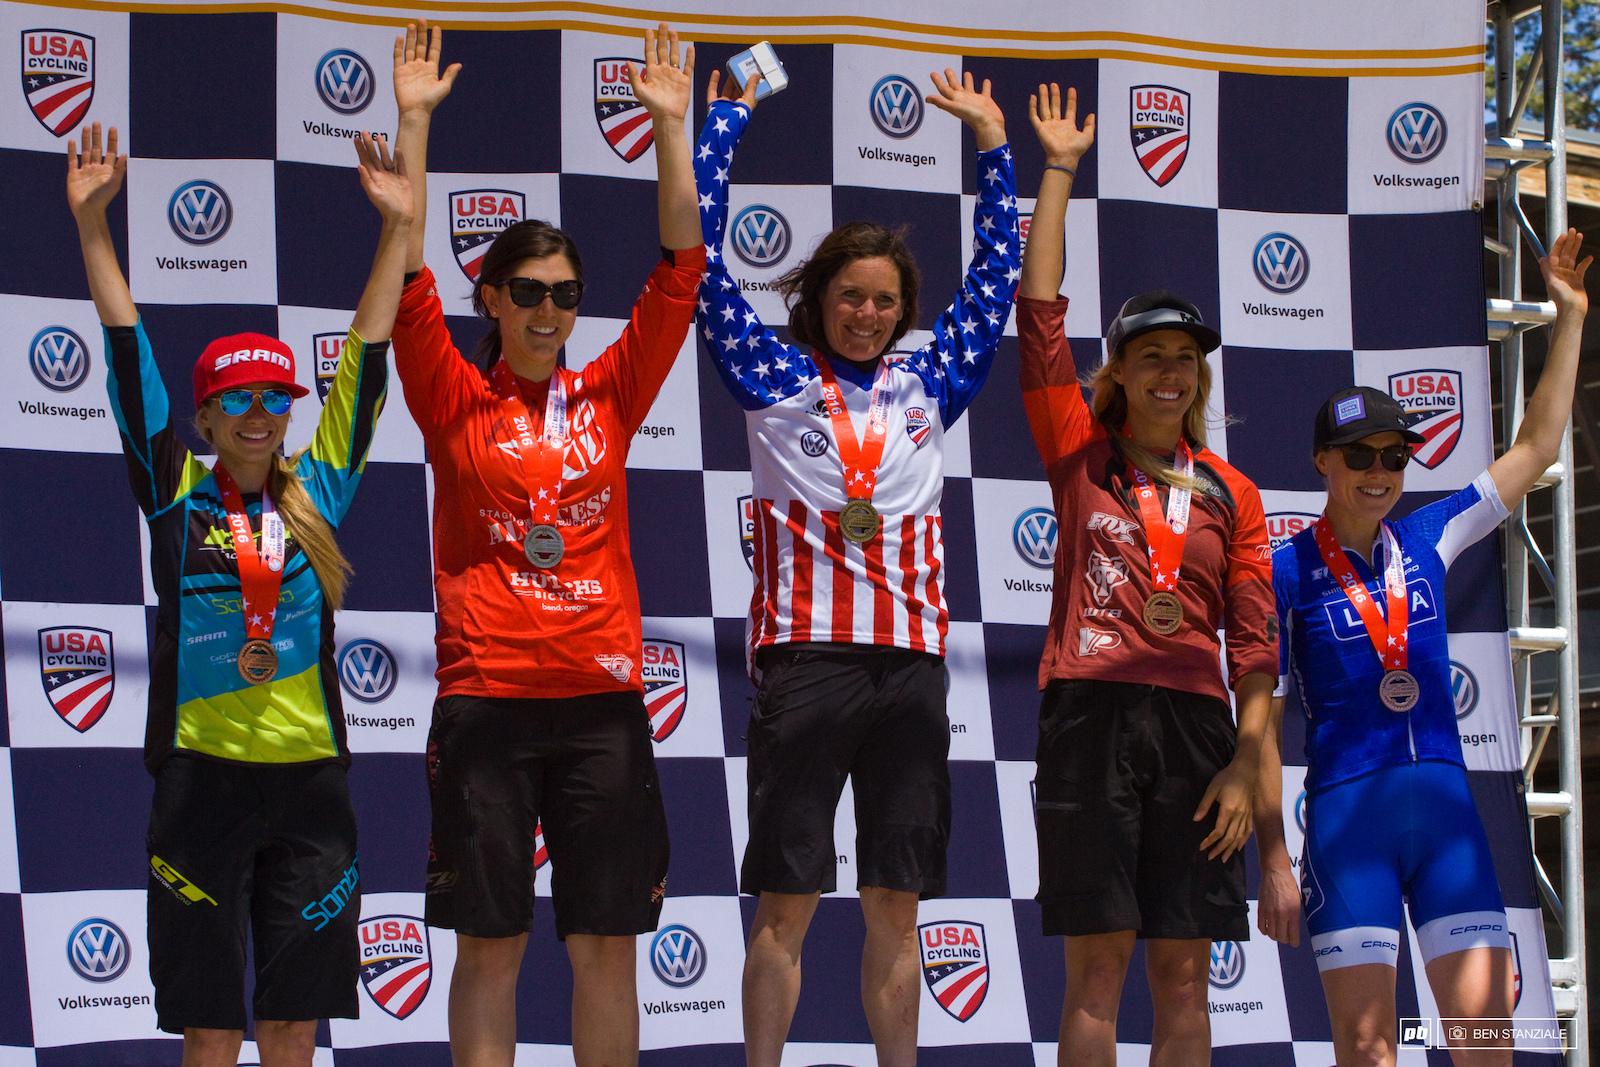 Your Womens Pro Enduro Podium 1st- Kelli Emmett. 2nd- Porsha Murdock. 3rd- Lauren Gregg. 4th- Rachel Throop. 5th- Georgia Gould.